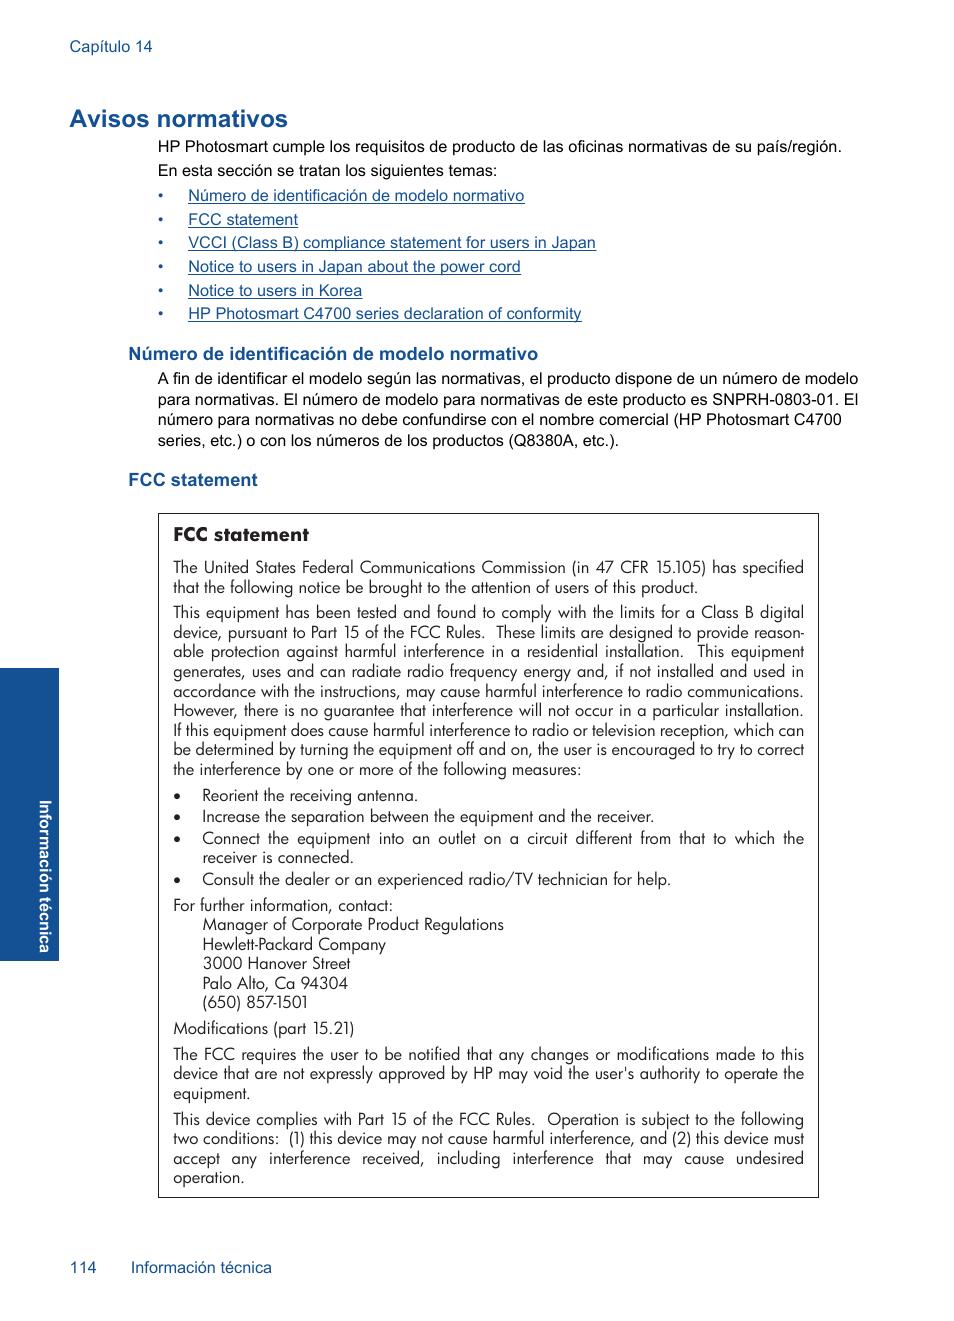 Avisos normativos, Número de identificación de modelo